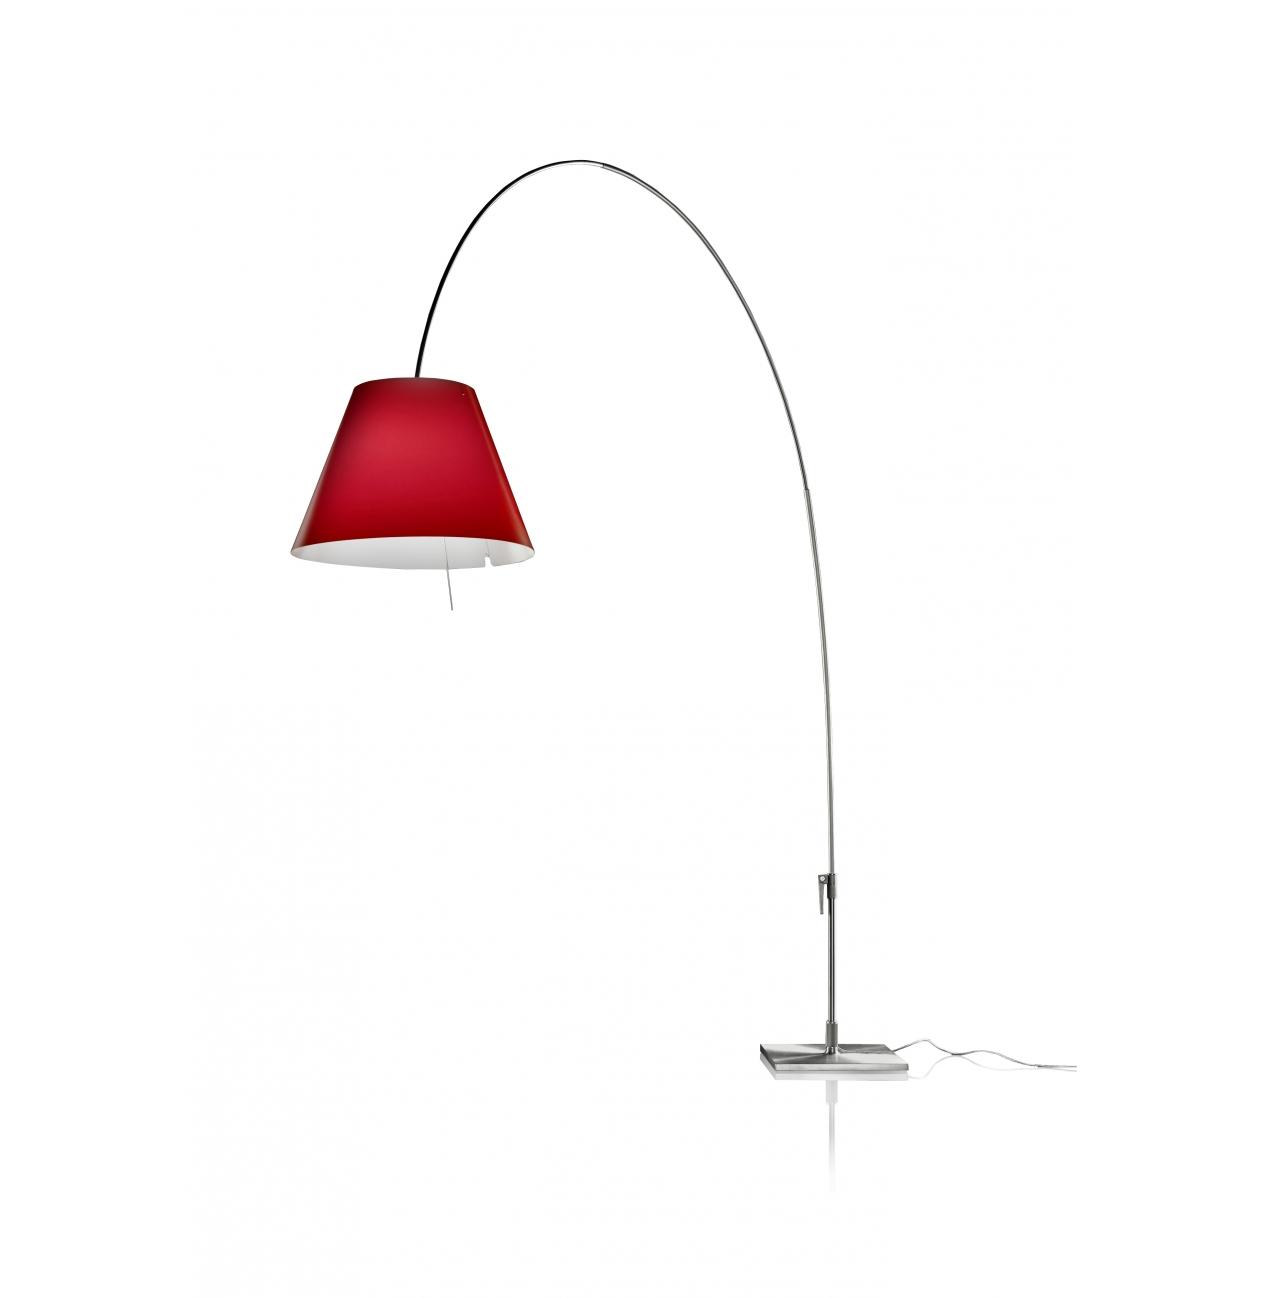 Luceplan vloerlamp lady costanza versteeg lichtstudio - Costanza vloerlamp ...